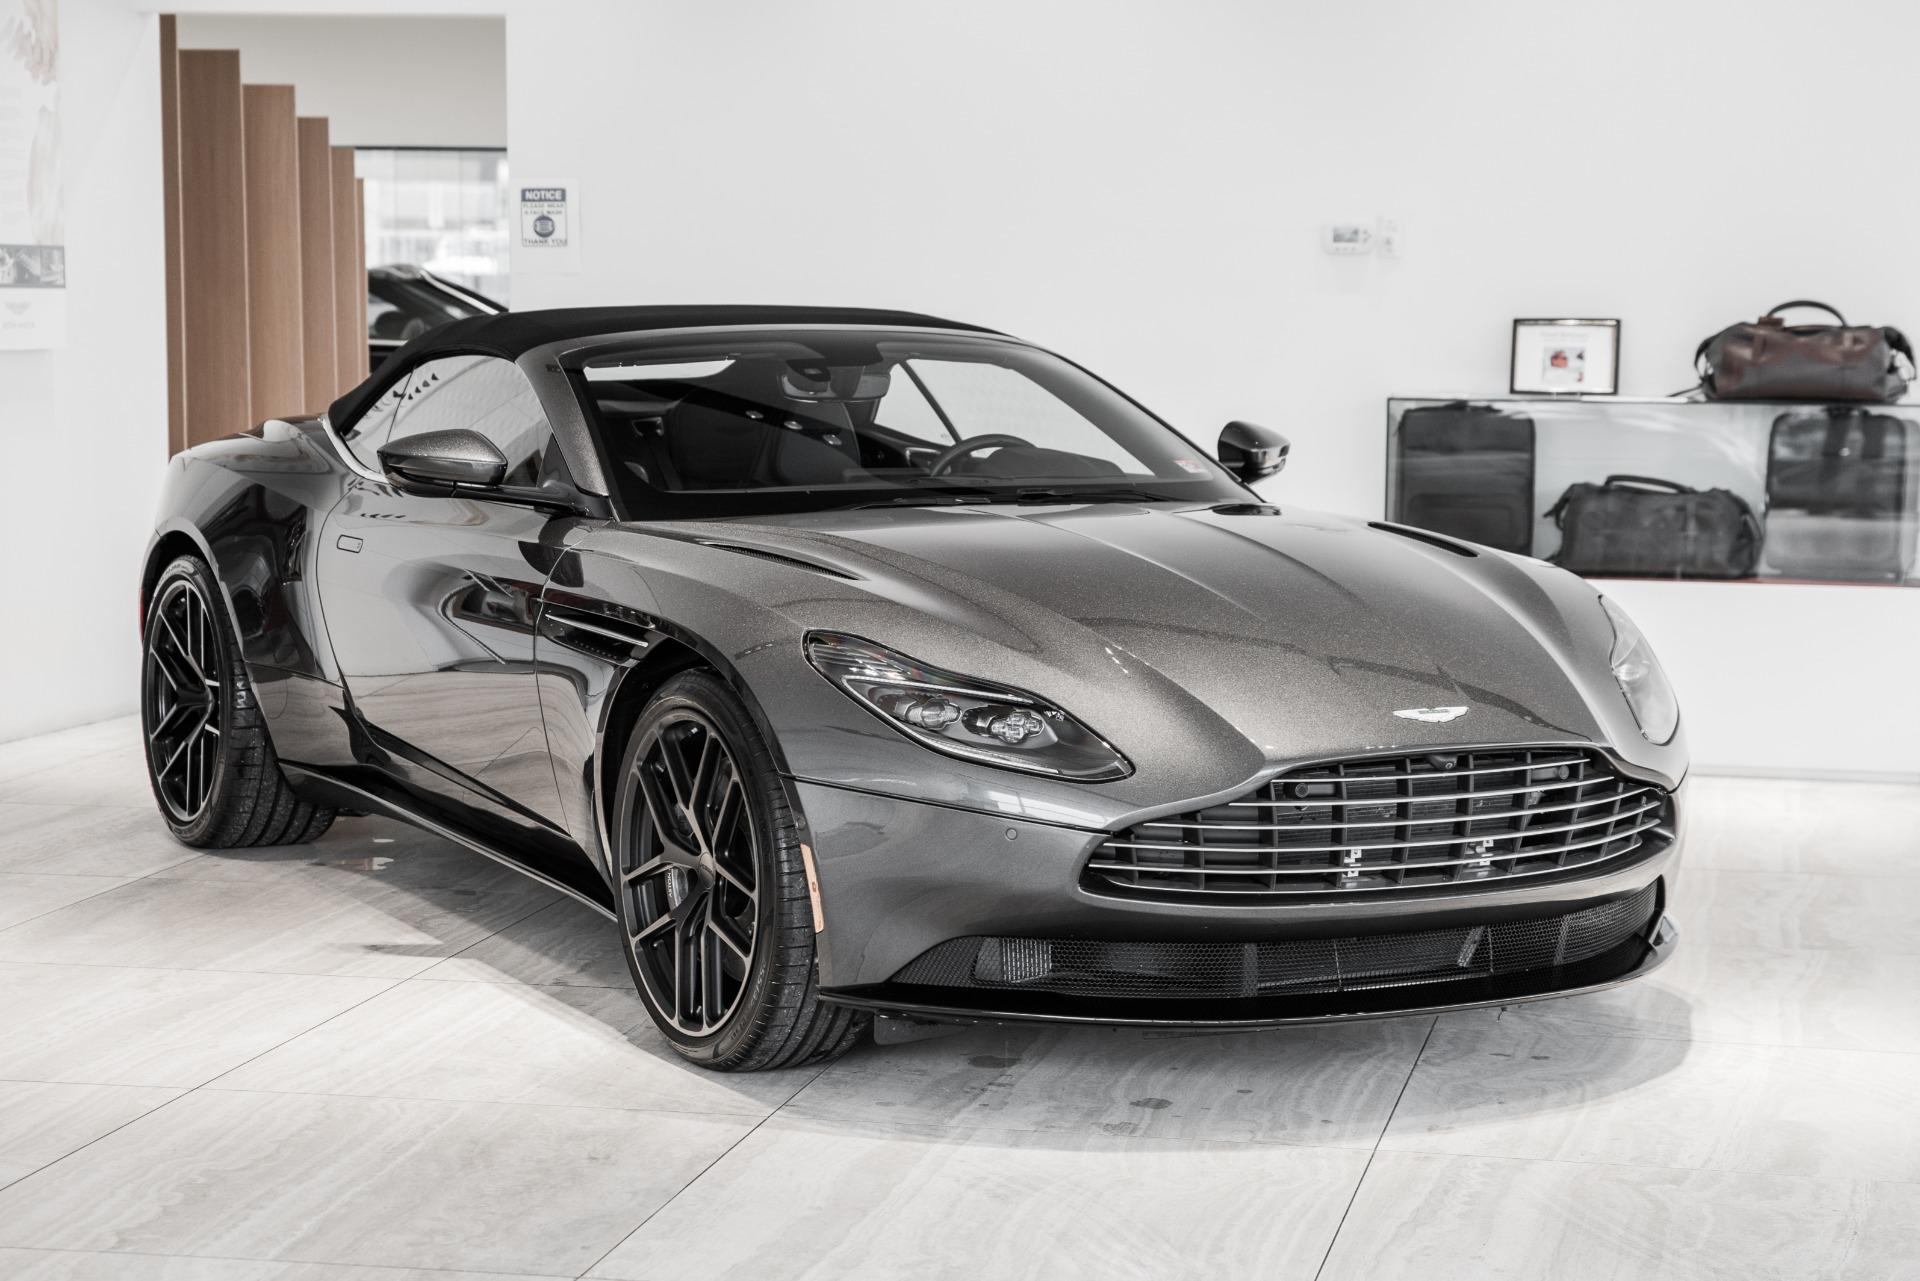 2019 Aston Martin Db11 Volante Stock 9nm08367 For Sale Near Vienna Va Va Aston Martin Dealer For Sale In Vienna Va 9nm08367 Exclusive Automotive Group